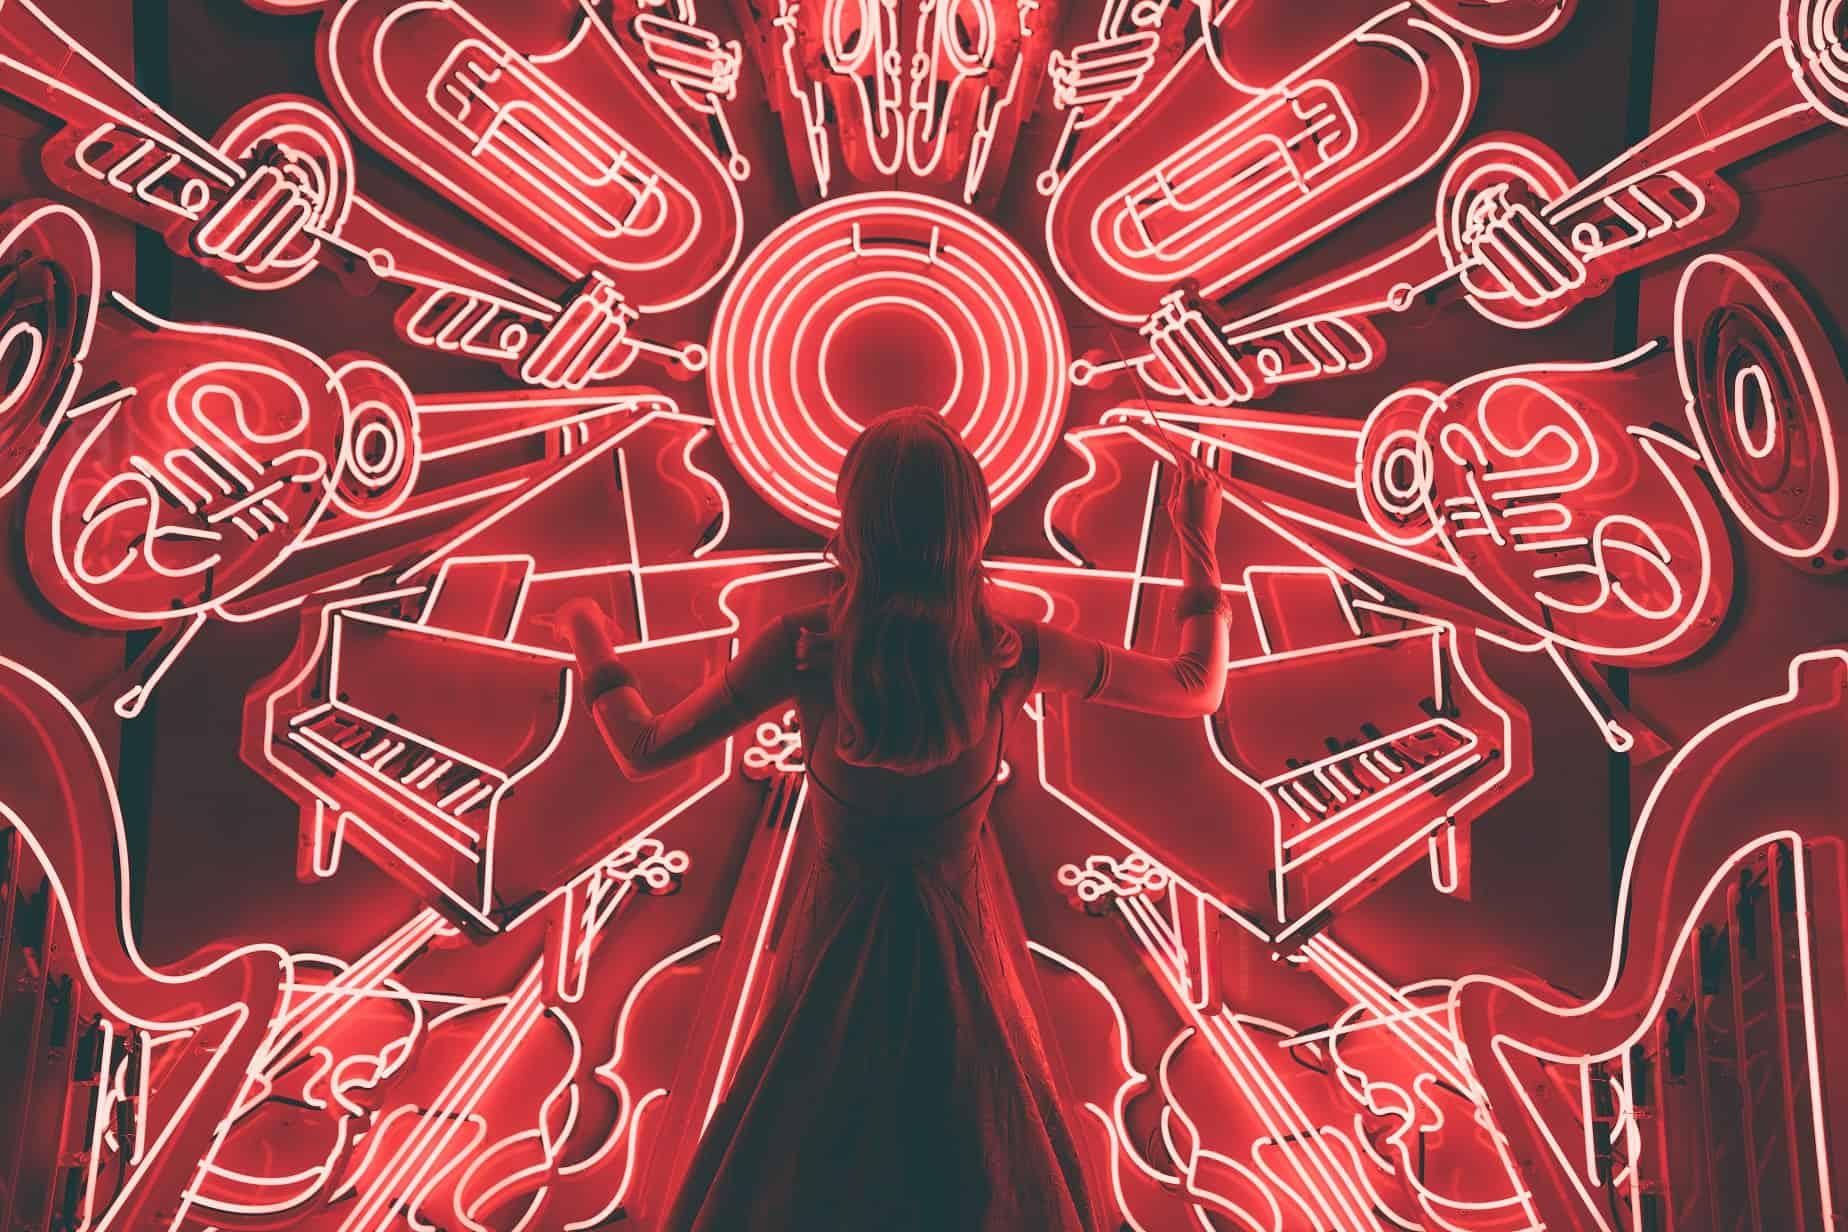 Music Artist composition